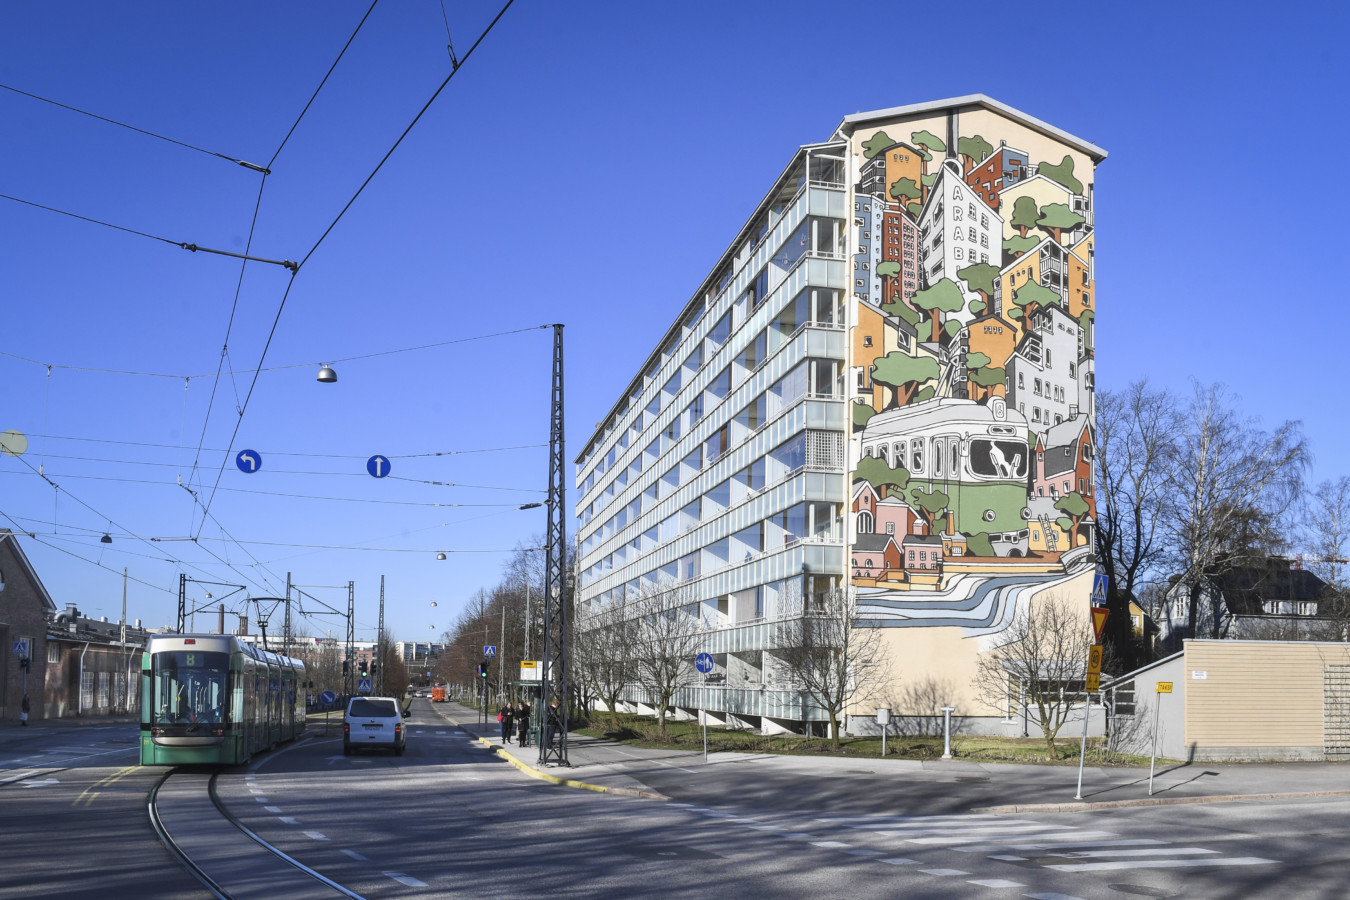 Helsingin kaupungin aineistopankki / Kimmo Brandt